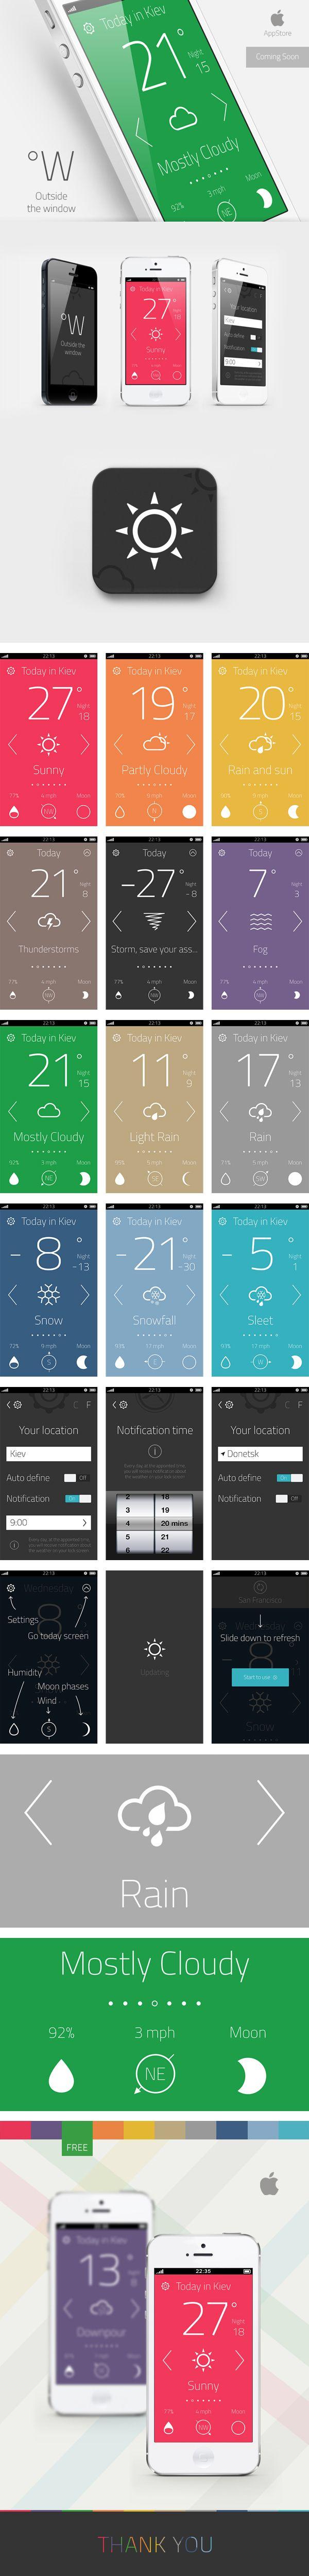 "Weather App ""Outside the window""  Интерфейс © Артем Свительский"